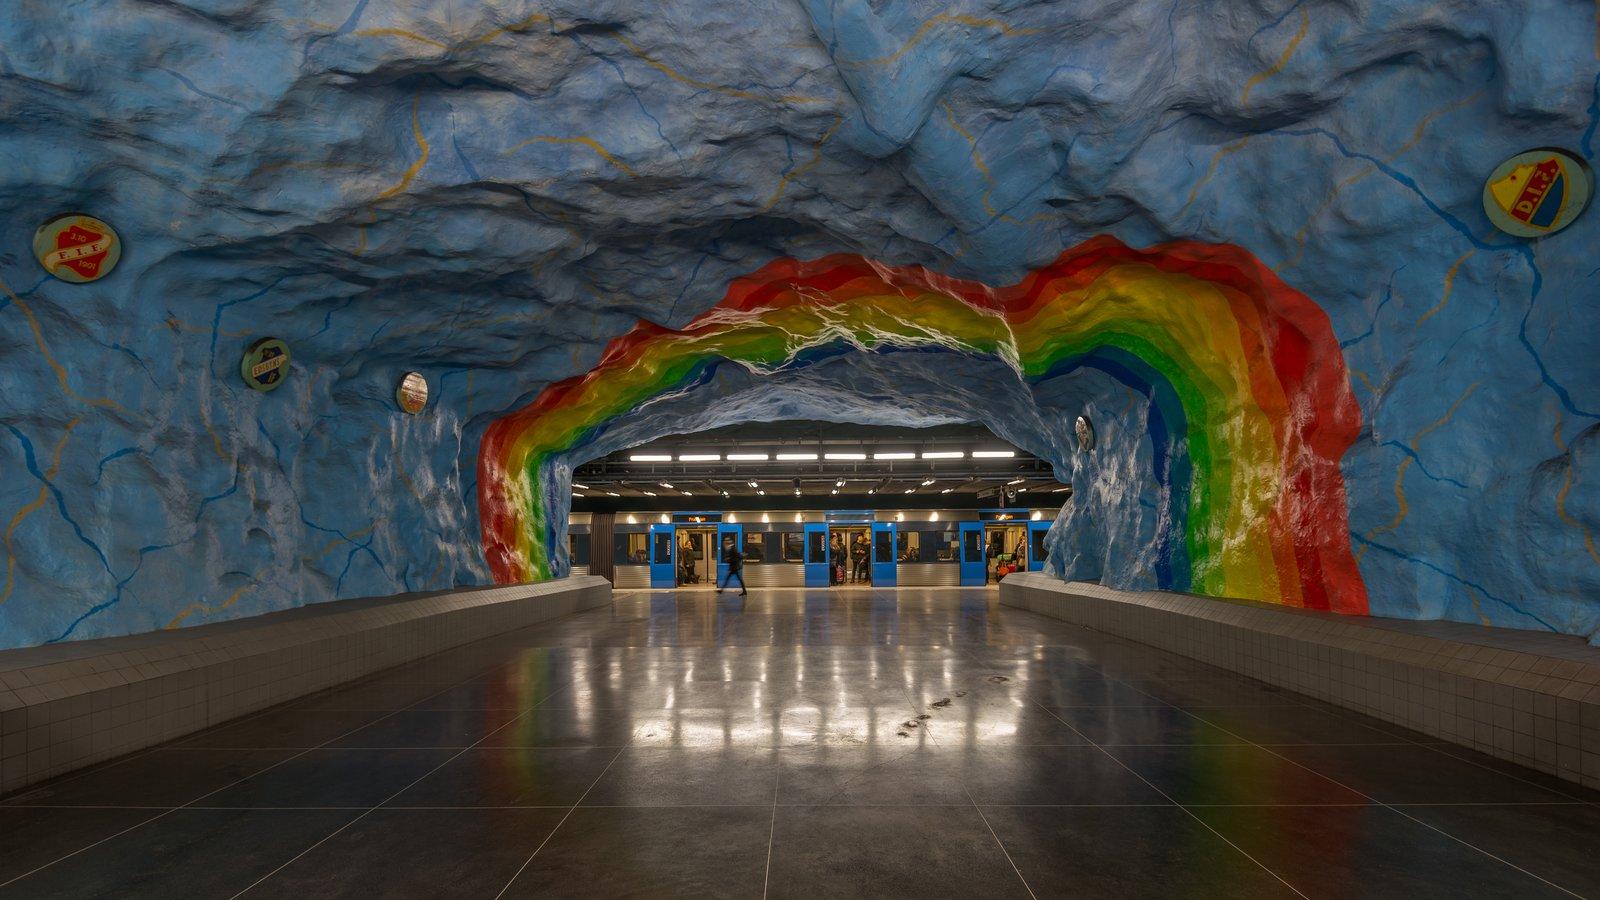 Photo 5 of 10 in Explore the Stockholm Metro For a Tour Through 5 Decades of European Art History